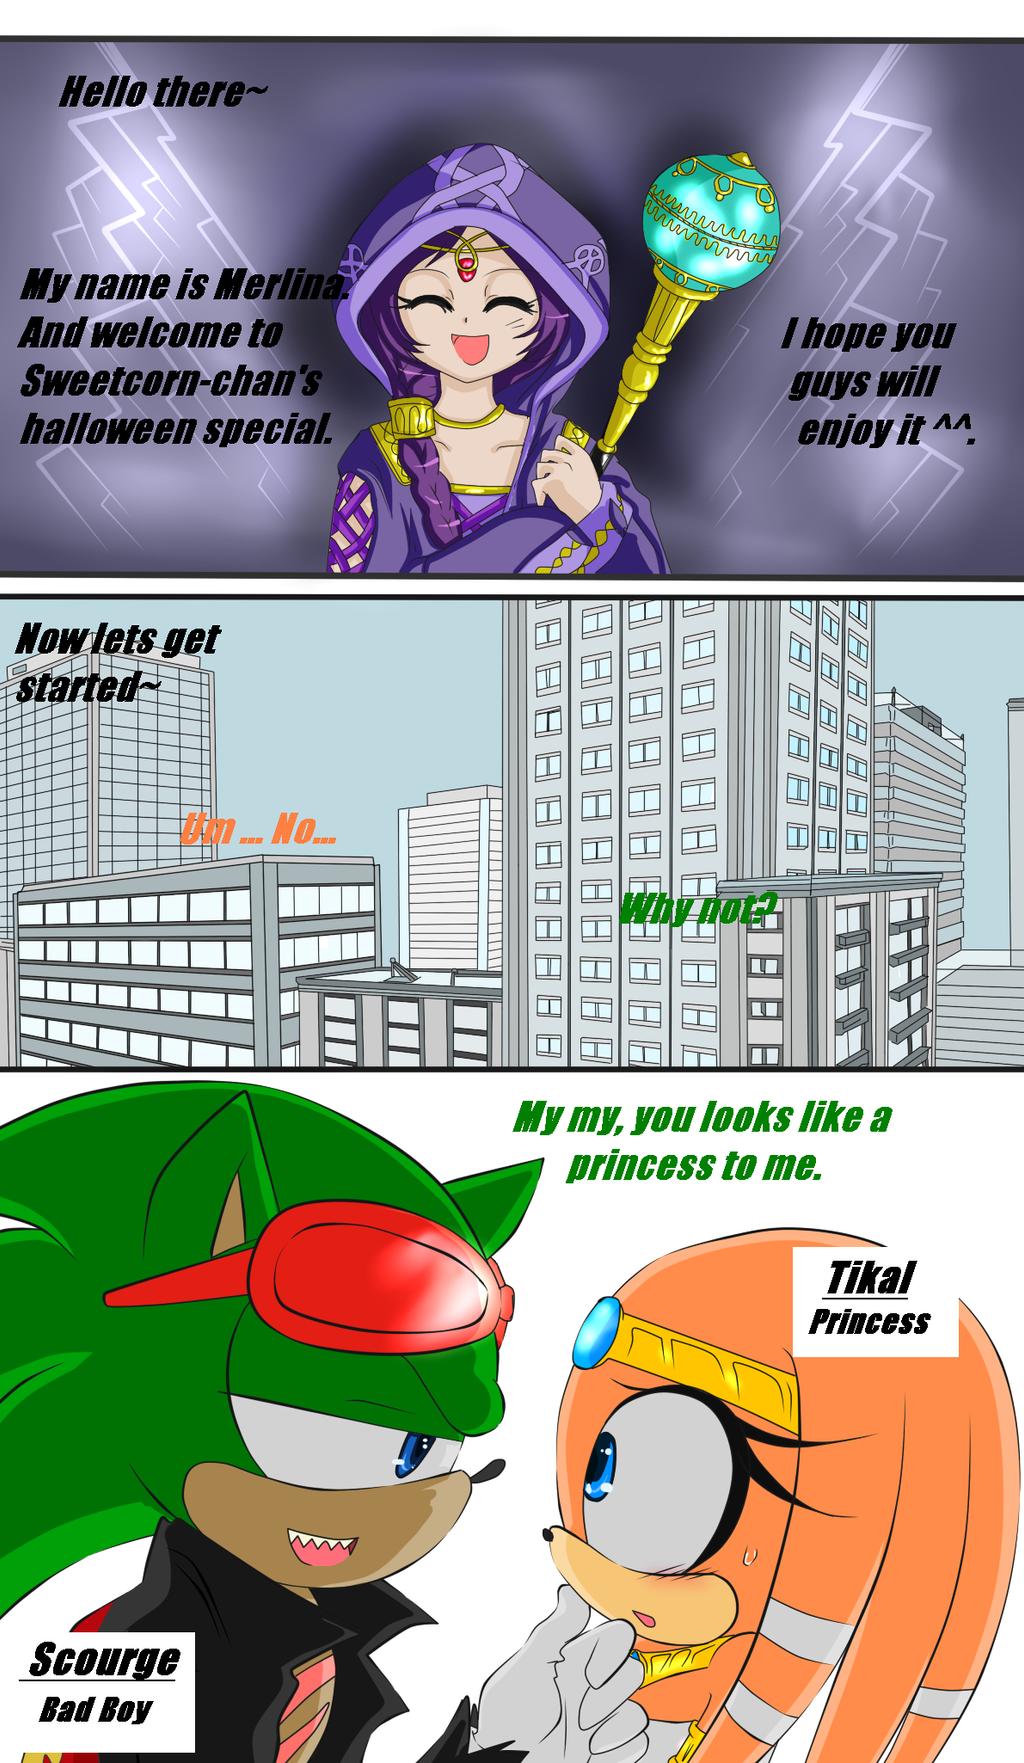 Arbeitsplatz chaos comic  Sonic halloween Curse - 01 by Sweetcorn-chan on DeviantArt